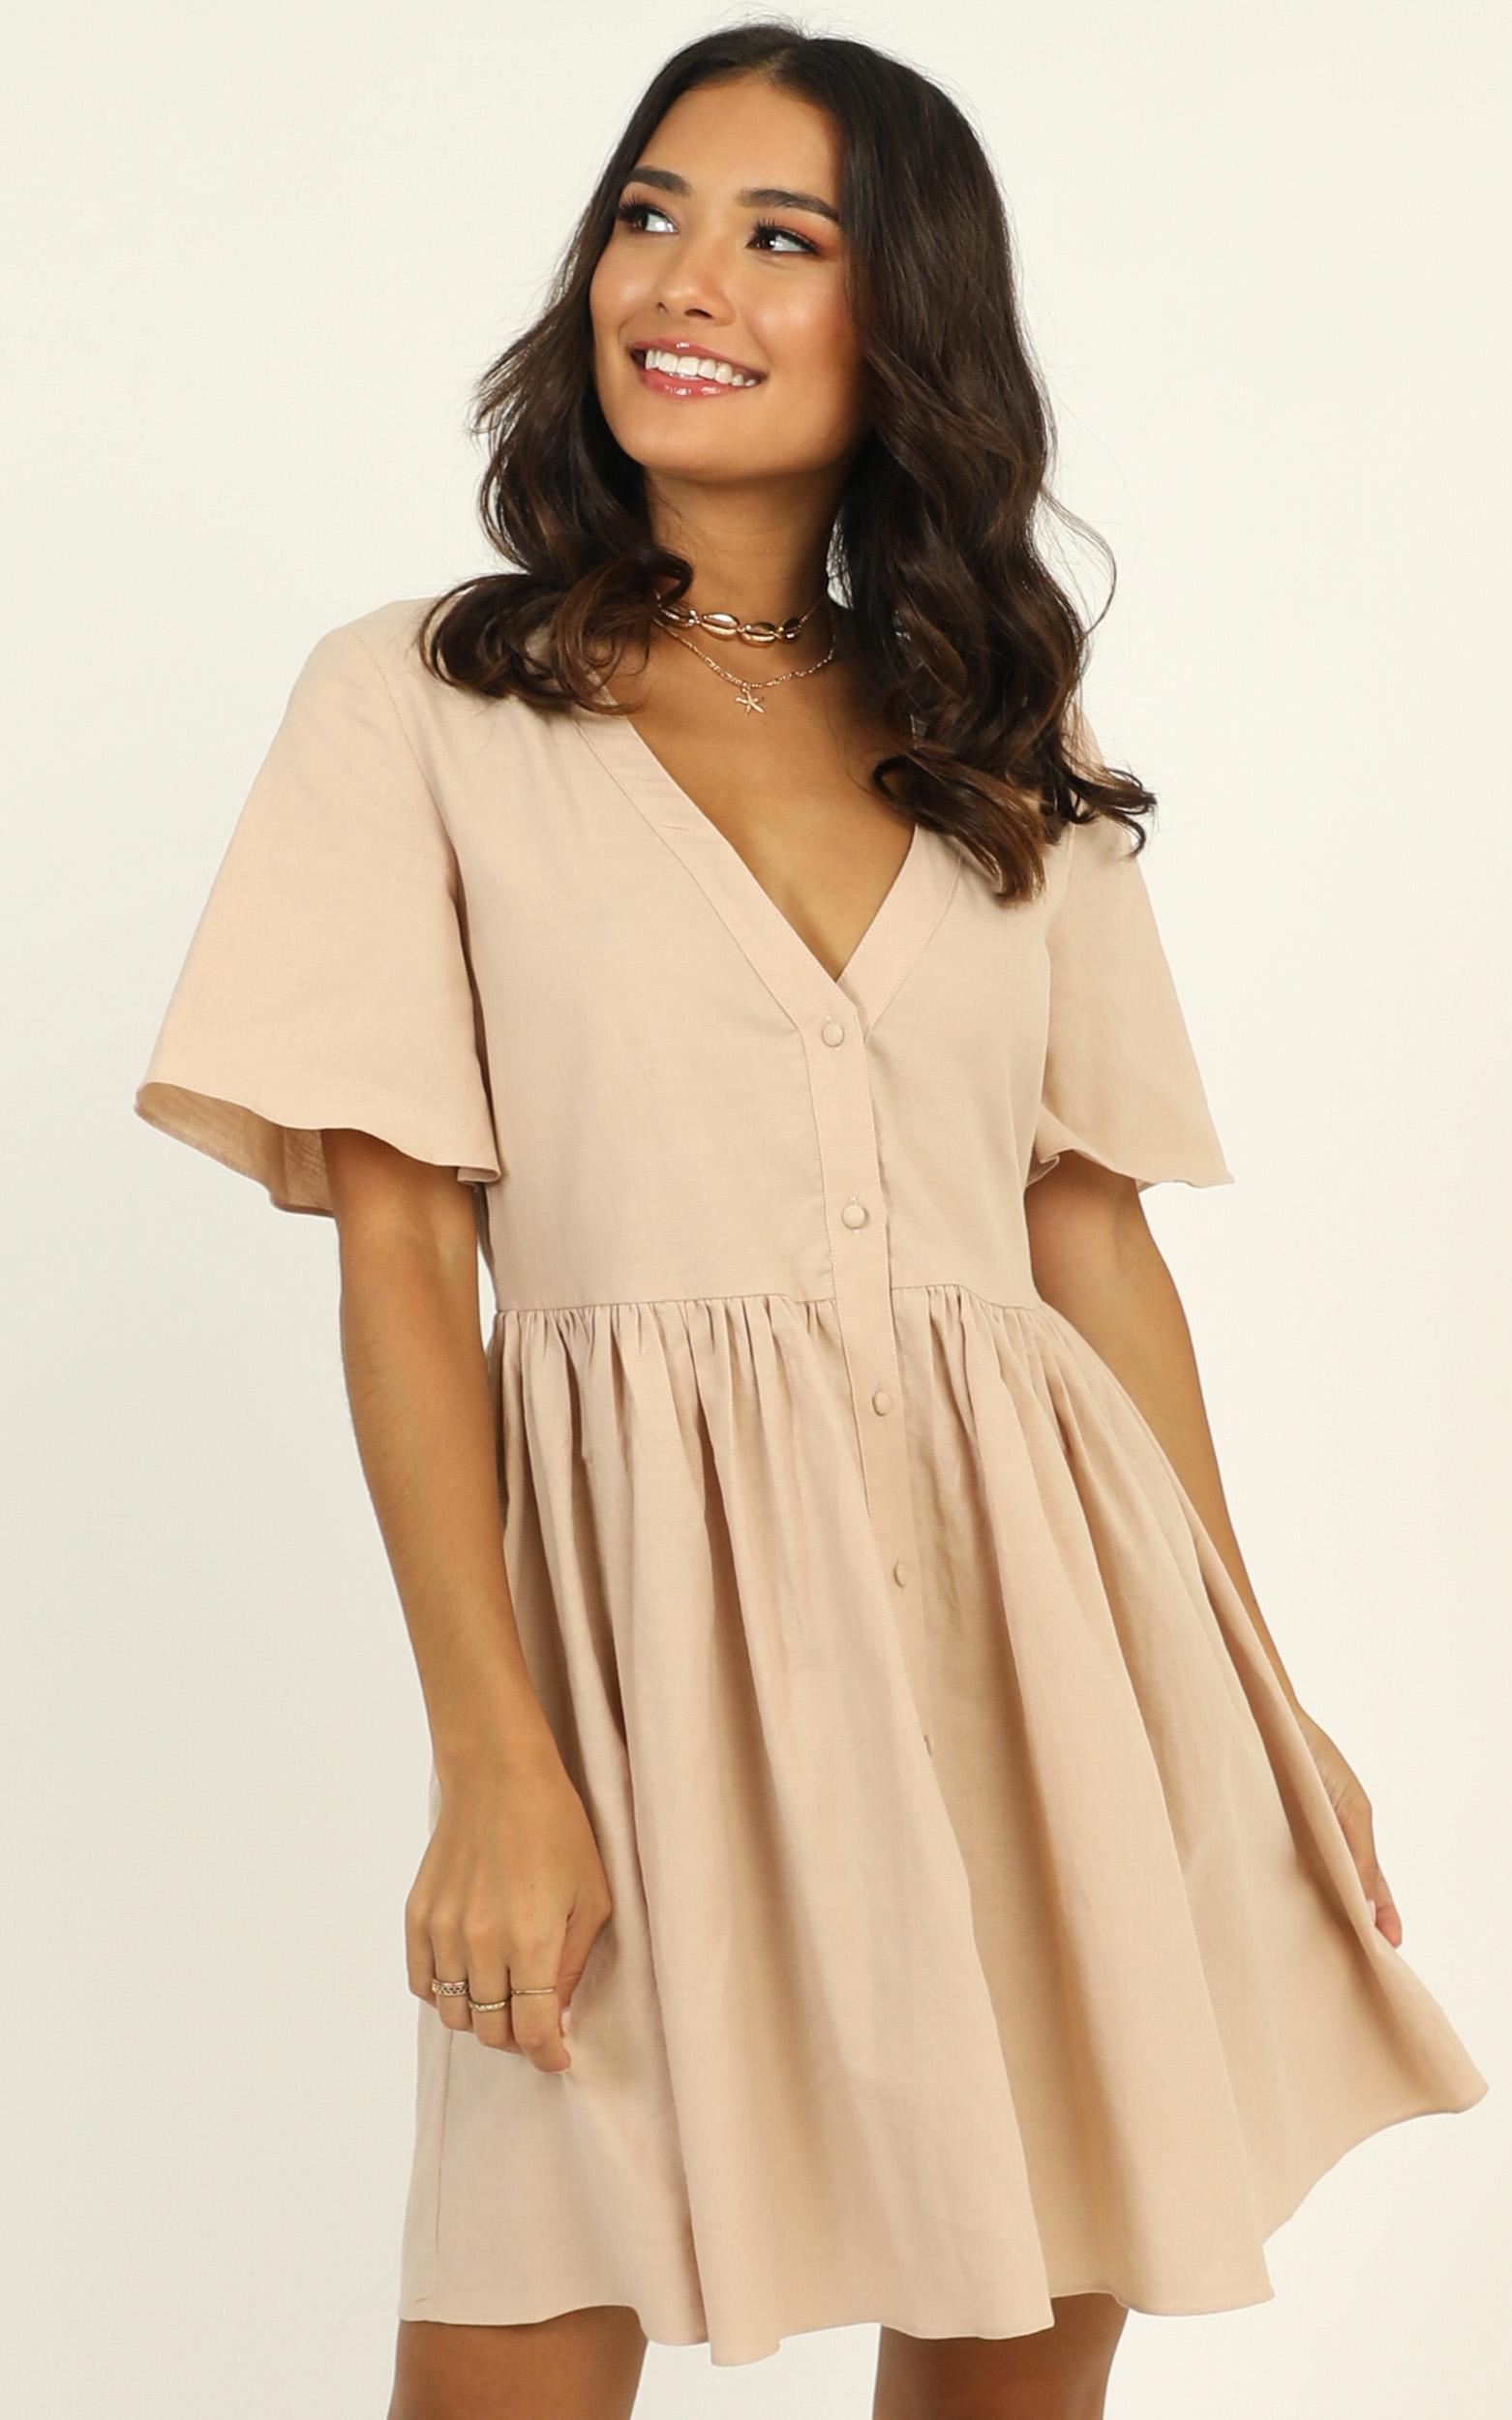 Staycation Dress in beige - 20 (XXXXL), Beige, hi-res image number null